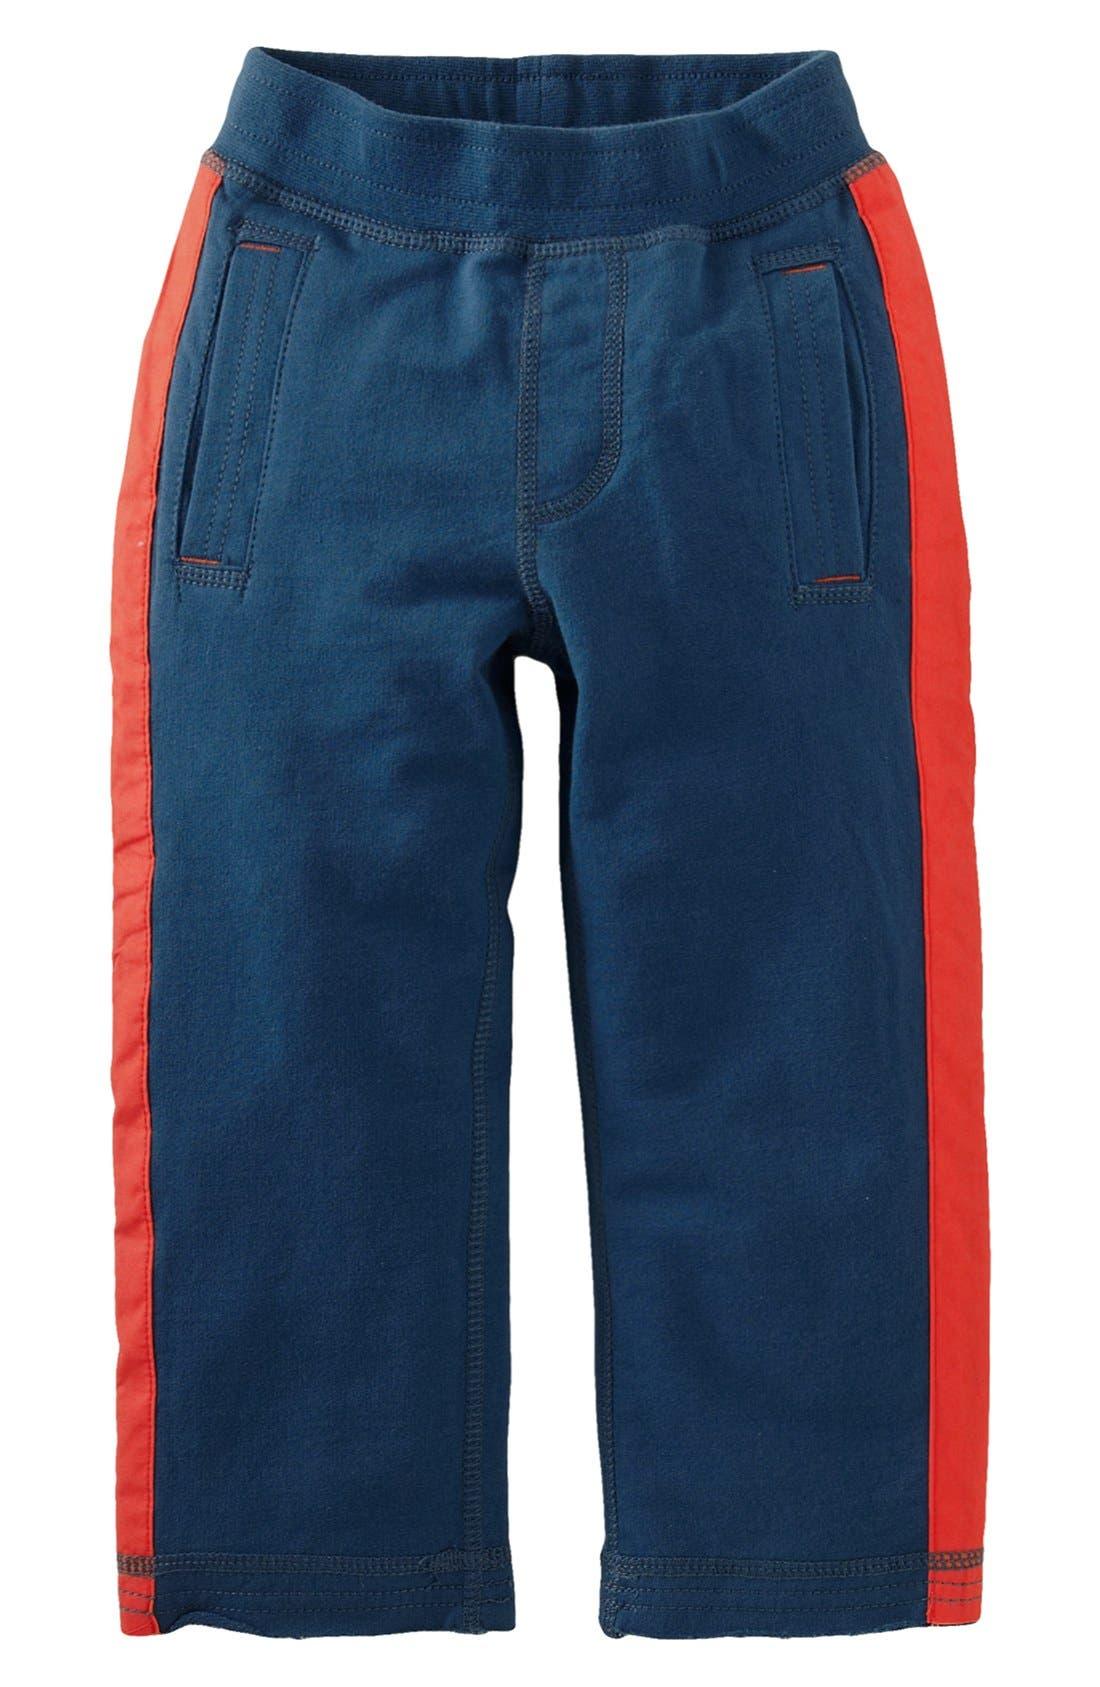 Alternate Image 1 Selected - Tea Collection Side Stripe Pants (Toddler Boys)